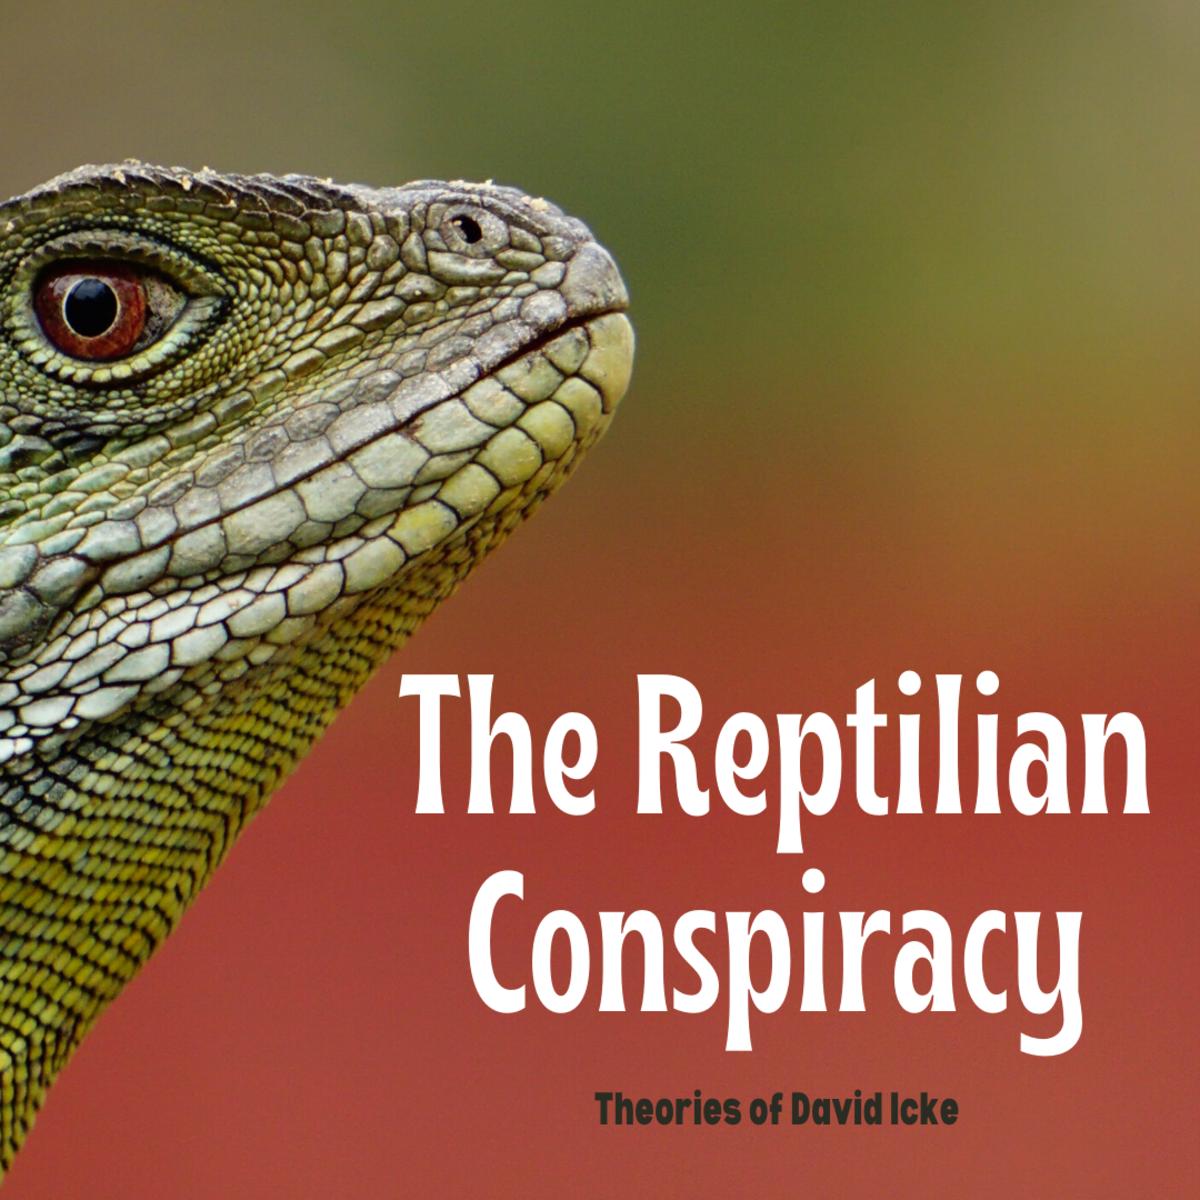 David Icke and the Reptilian Conspiracy